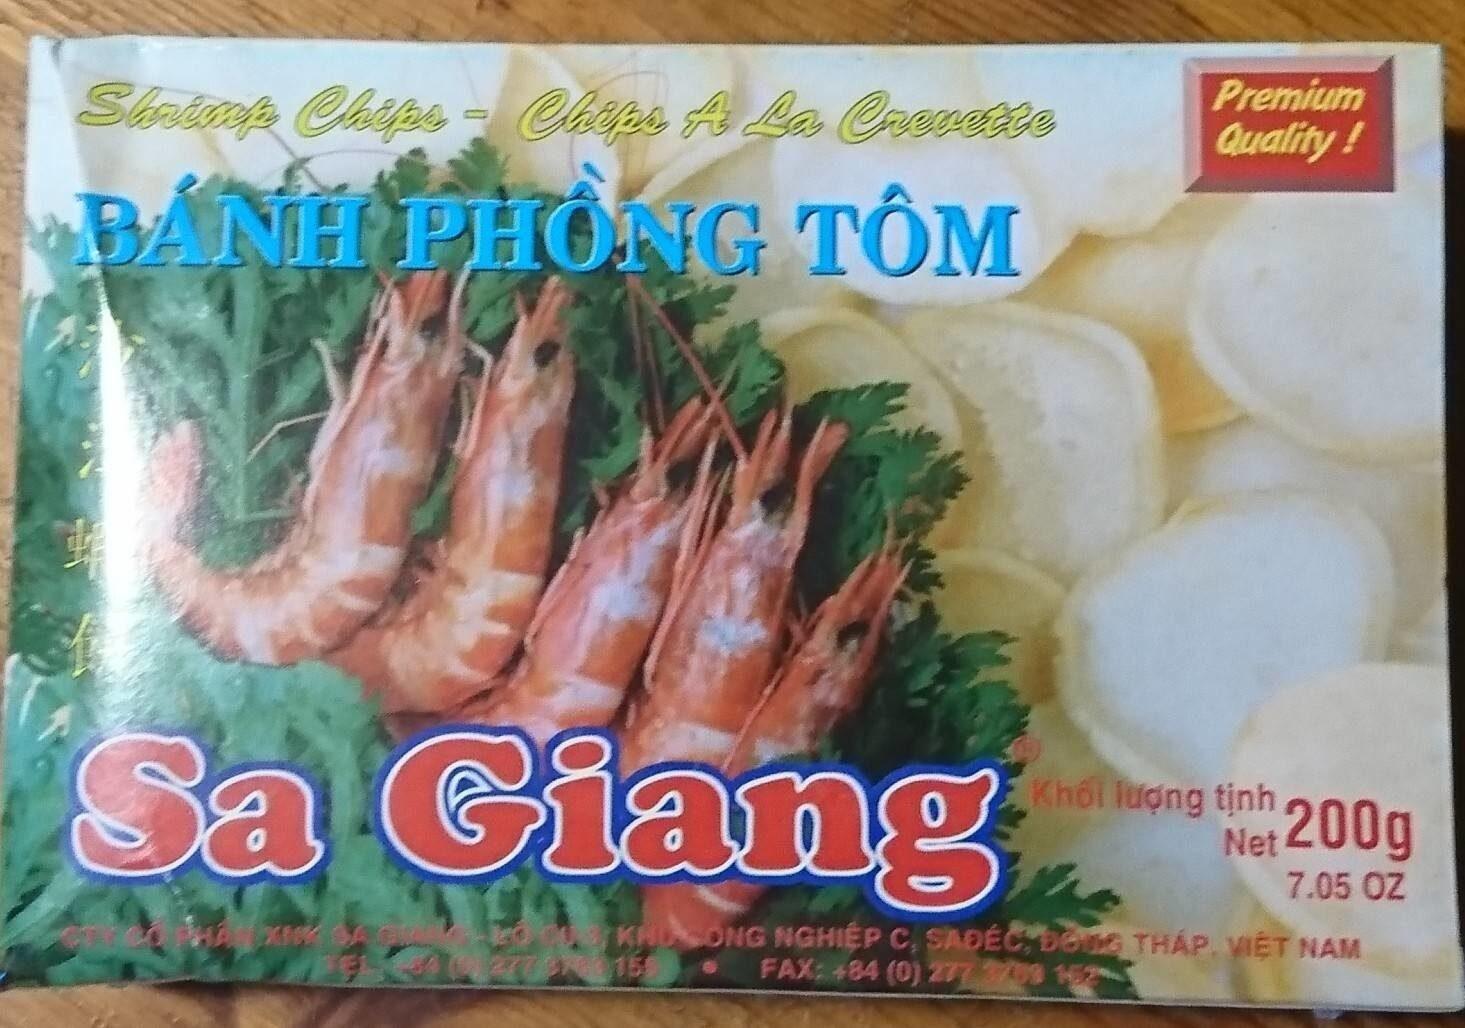 Crevettes chinoises - Información nutricional - fr